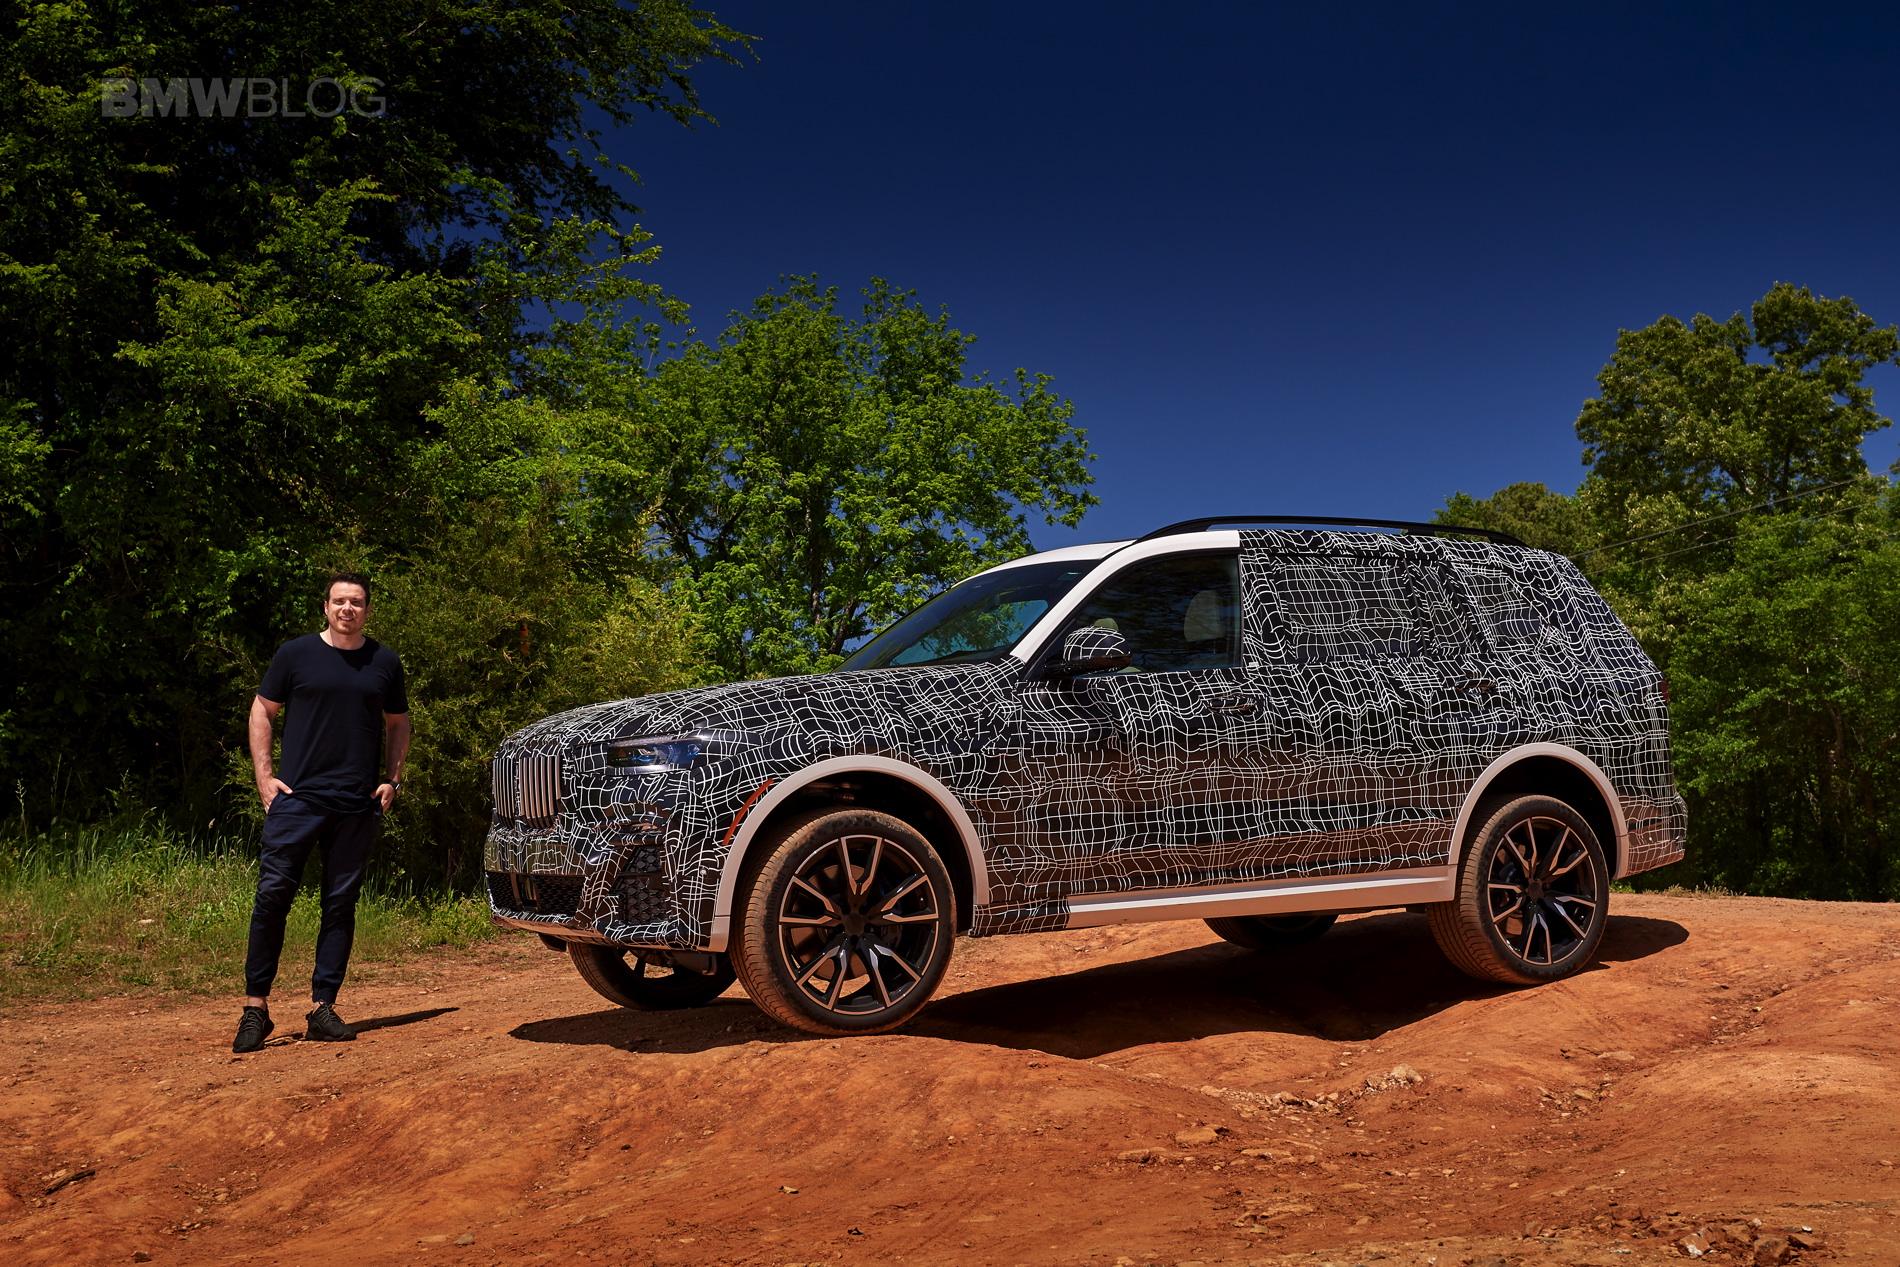 BMW X7 BMWBLOG review 09